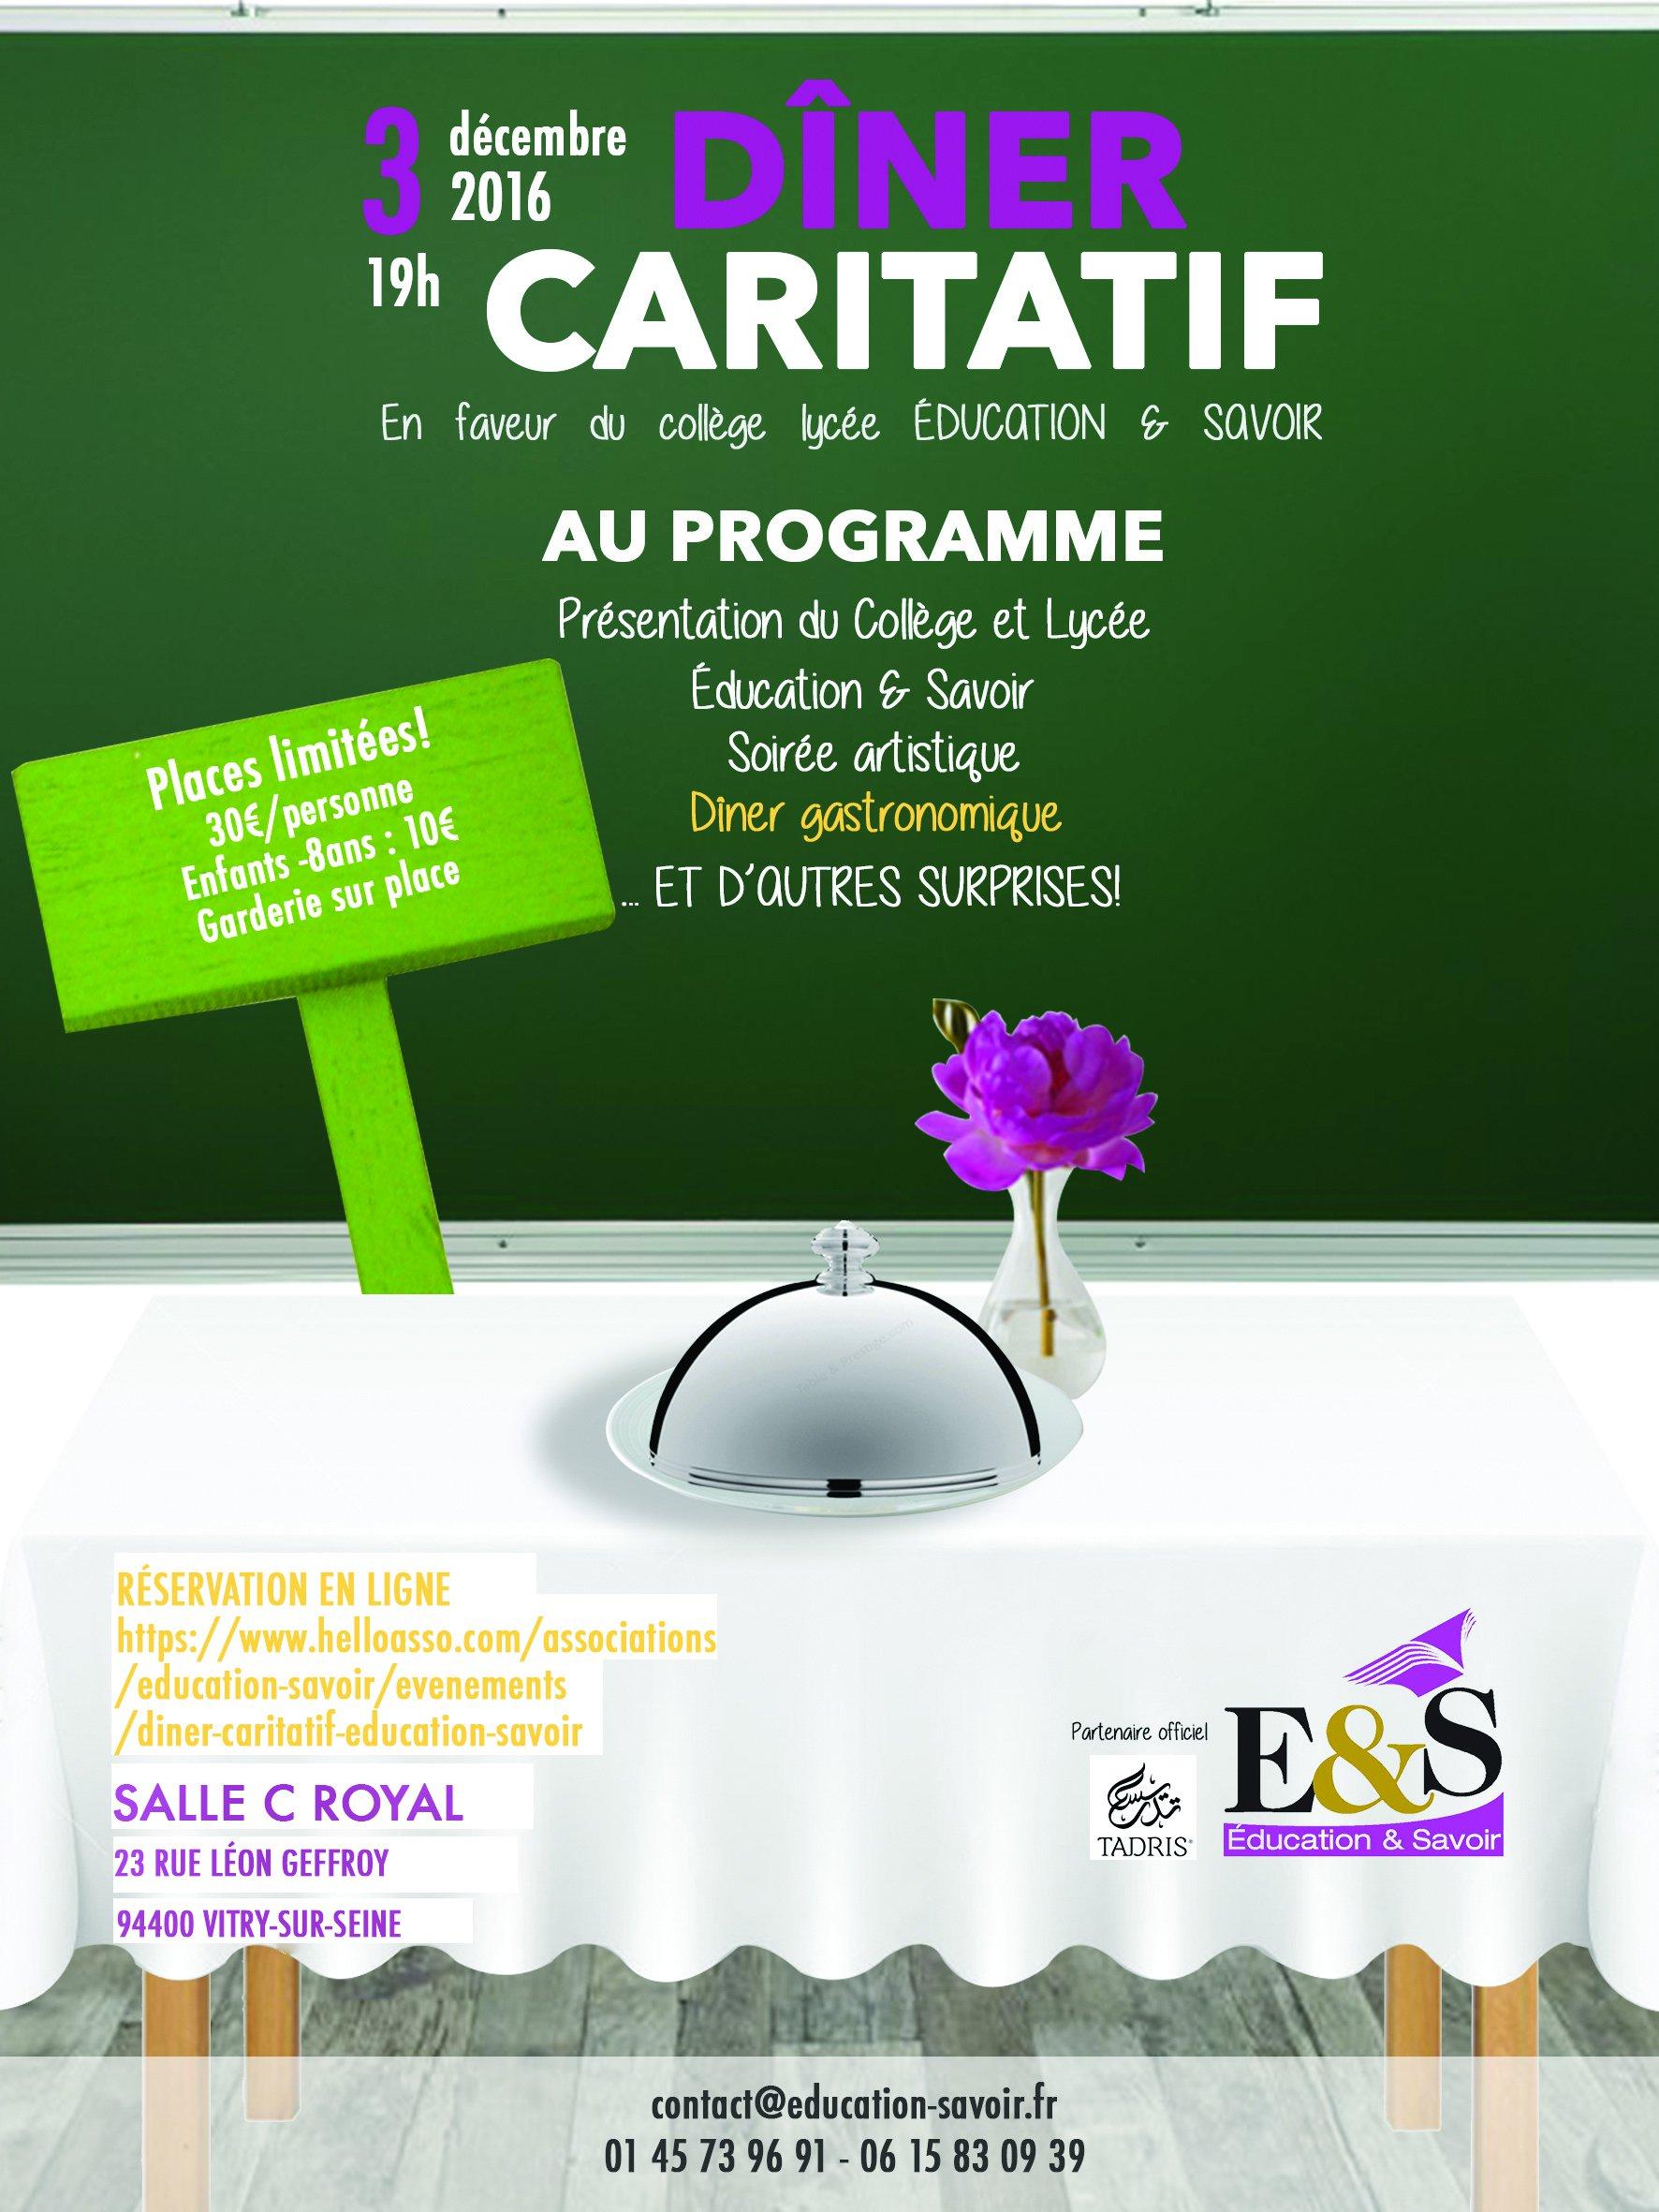 http://www.saphirnews.com/agenda/Gala-caritatif-pour-le-college-lycee-prive-Education-Savoir_ae420233.html